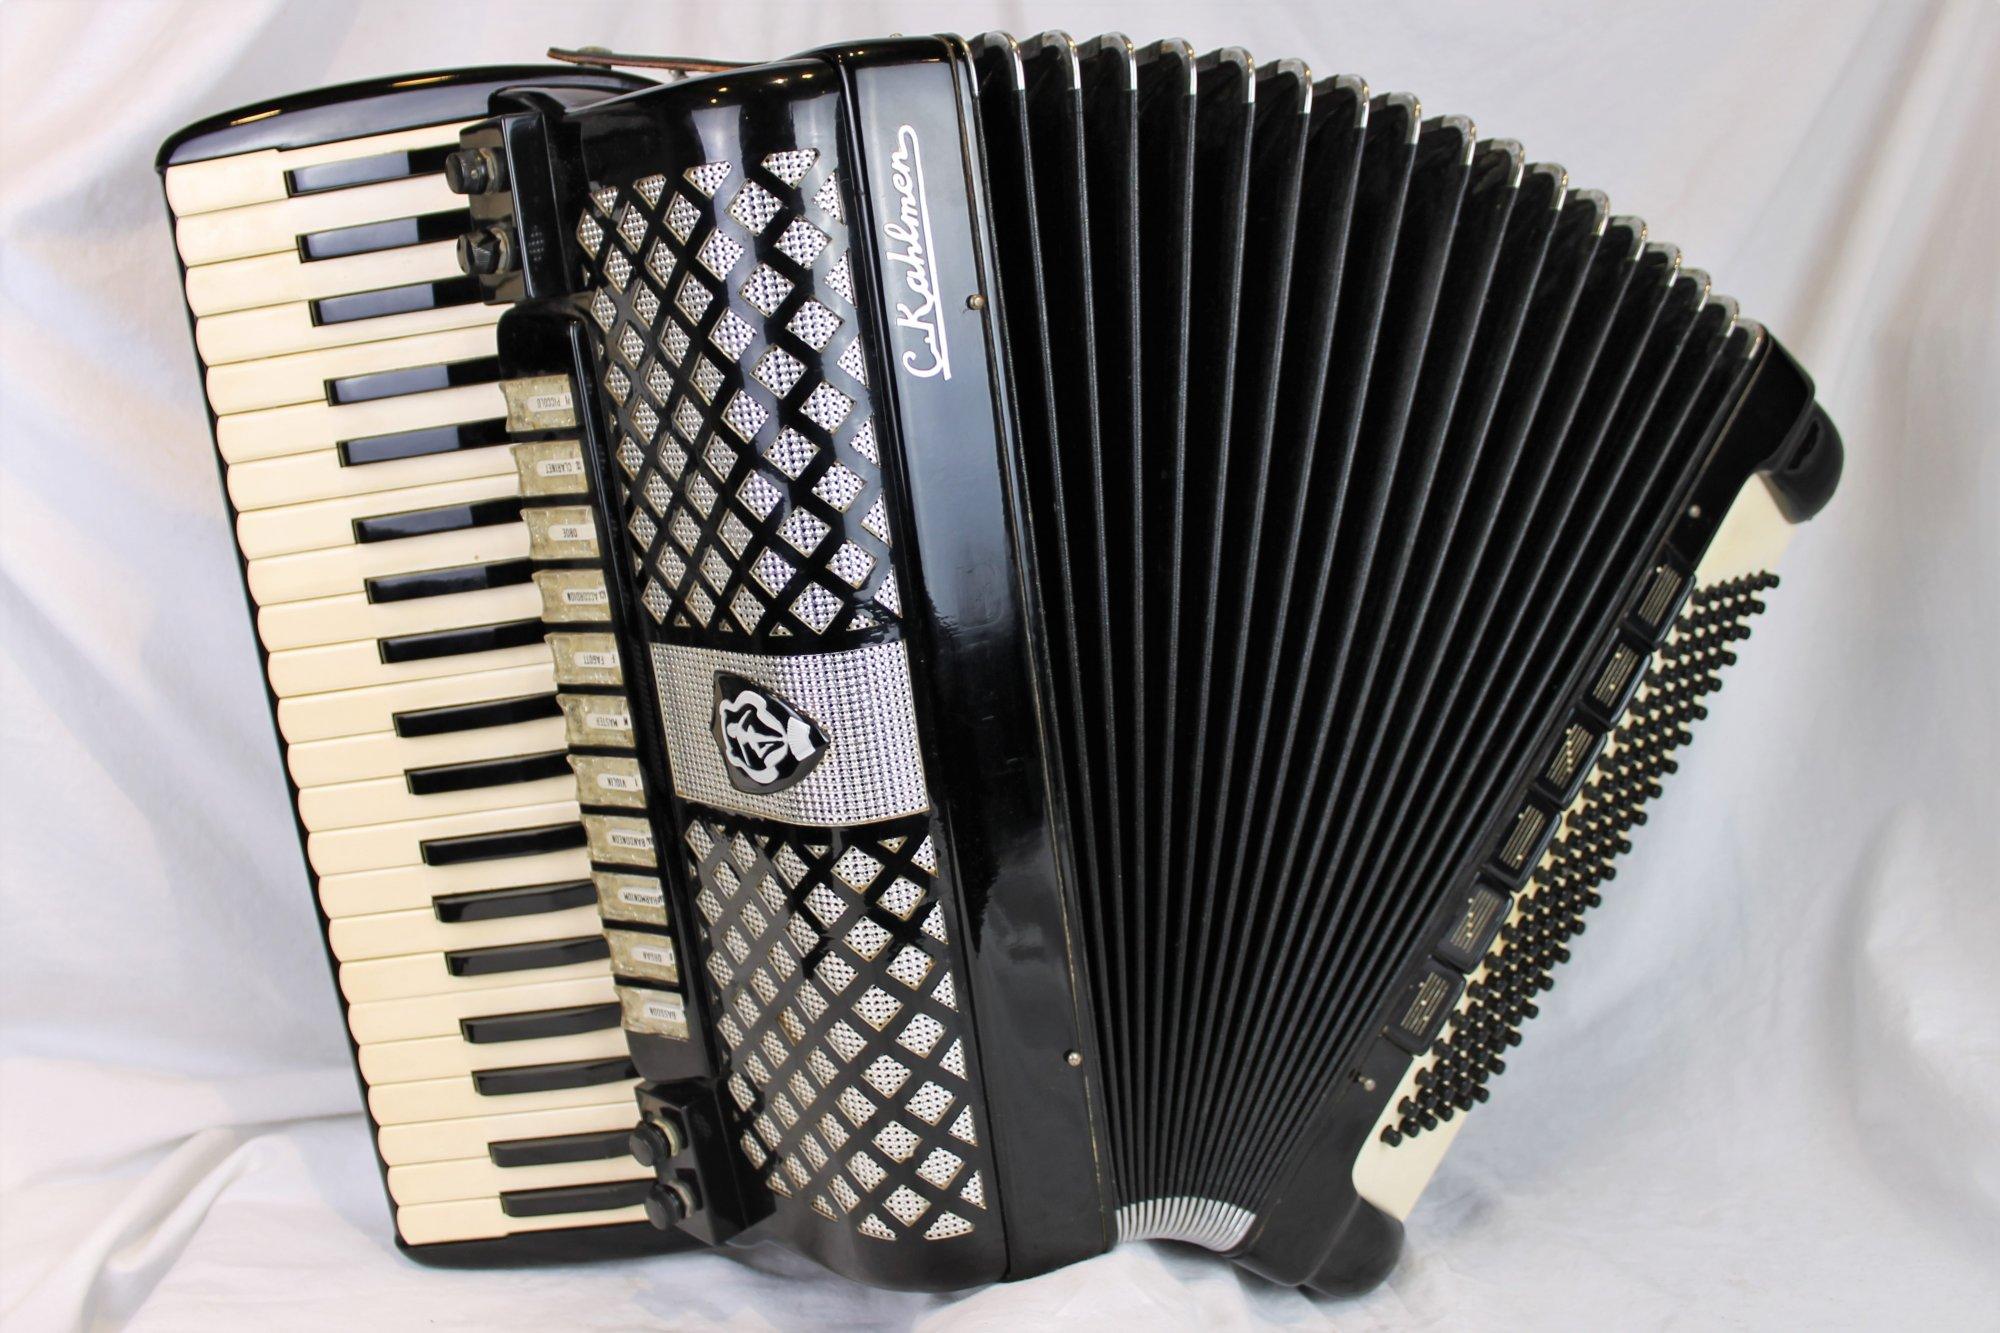 4328 - Black C. Kahlmen Tone Chamber Piano Accordion LMMH 41 120